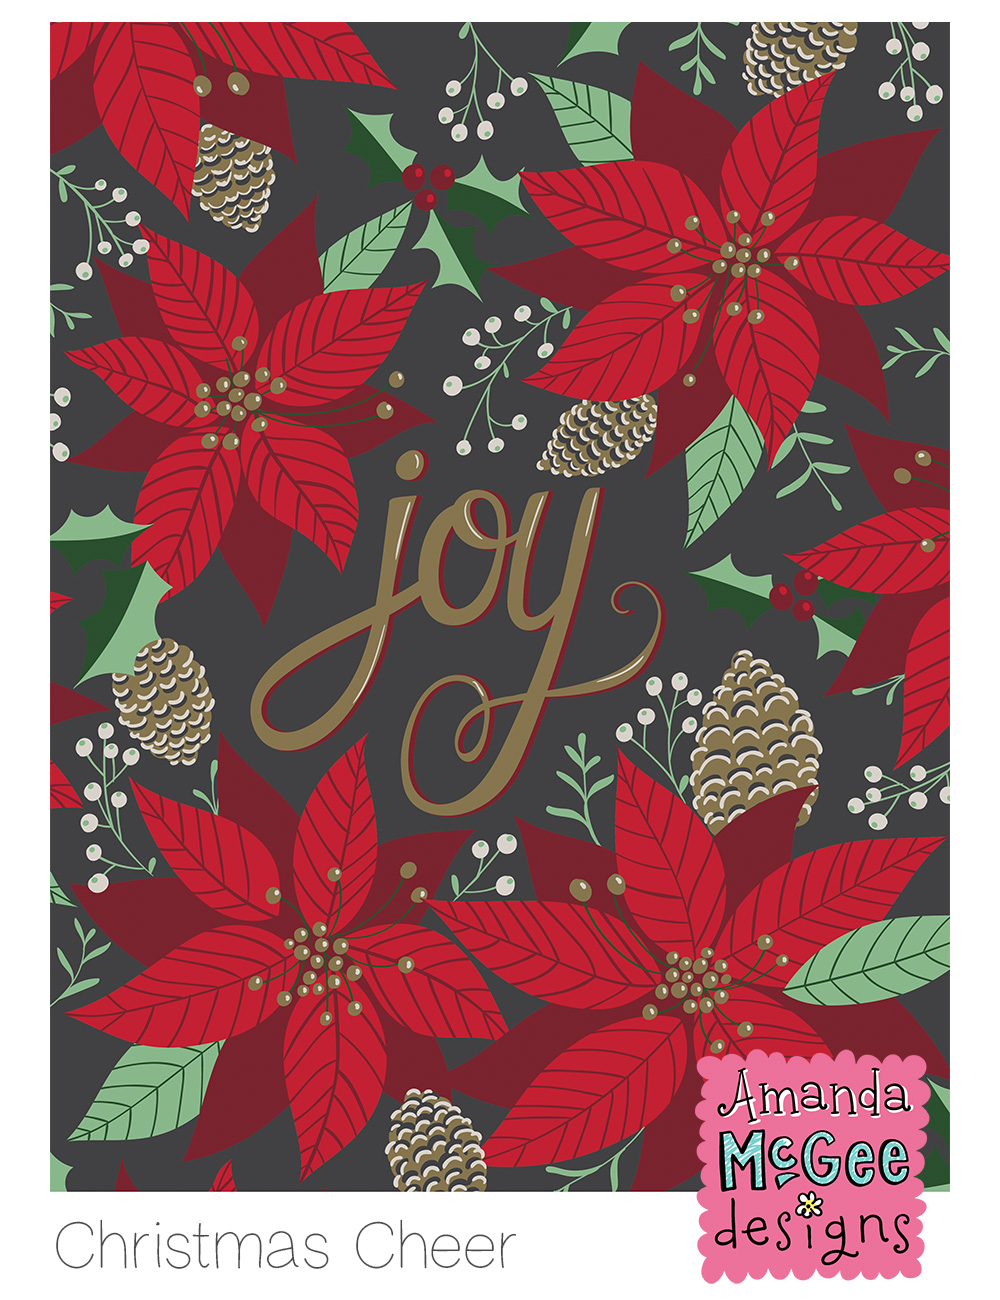 AmandaMcGee_SurfacePattern_ChristmasCheer-Poinsettias.jpg